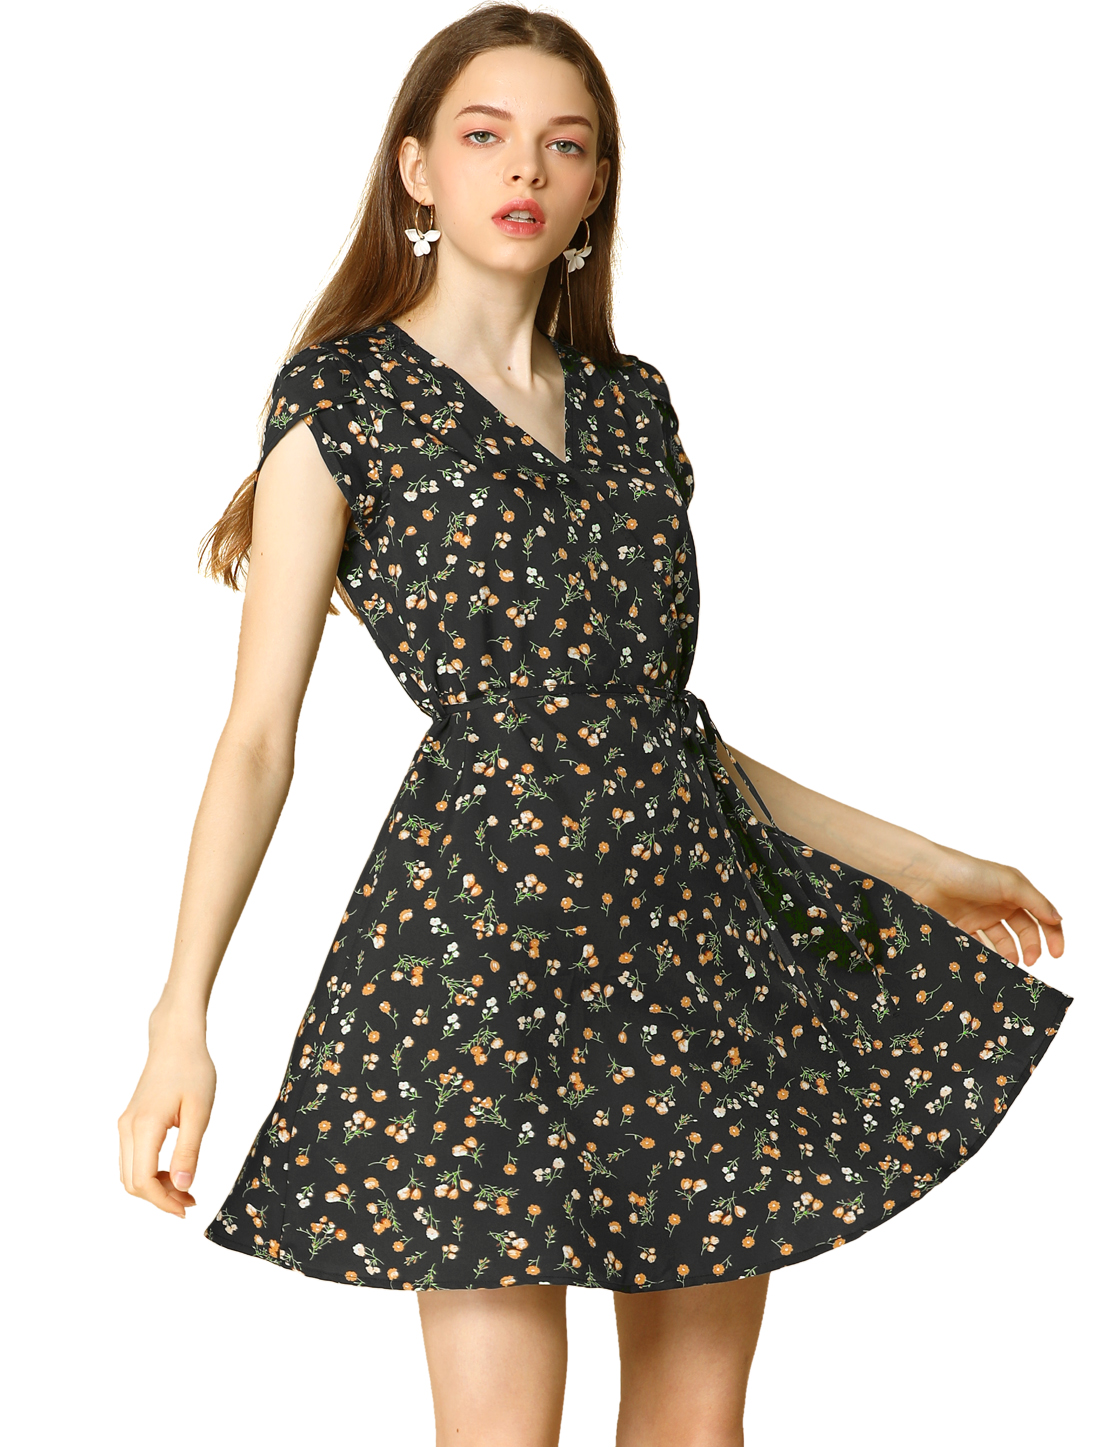 Allegra K Women's Floral Crossover V Neck Petal Sleeves Flowy Dress Black M